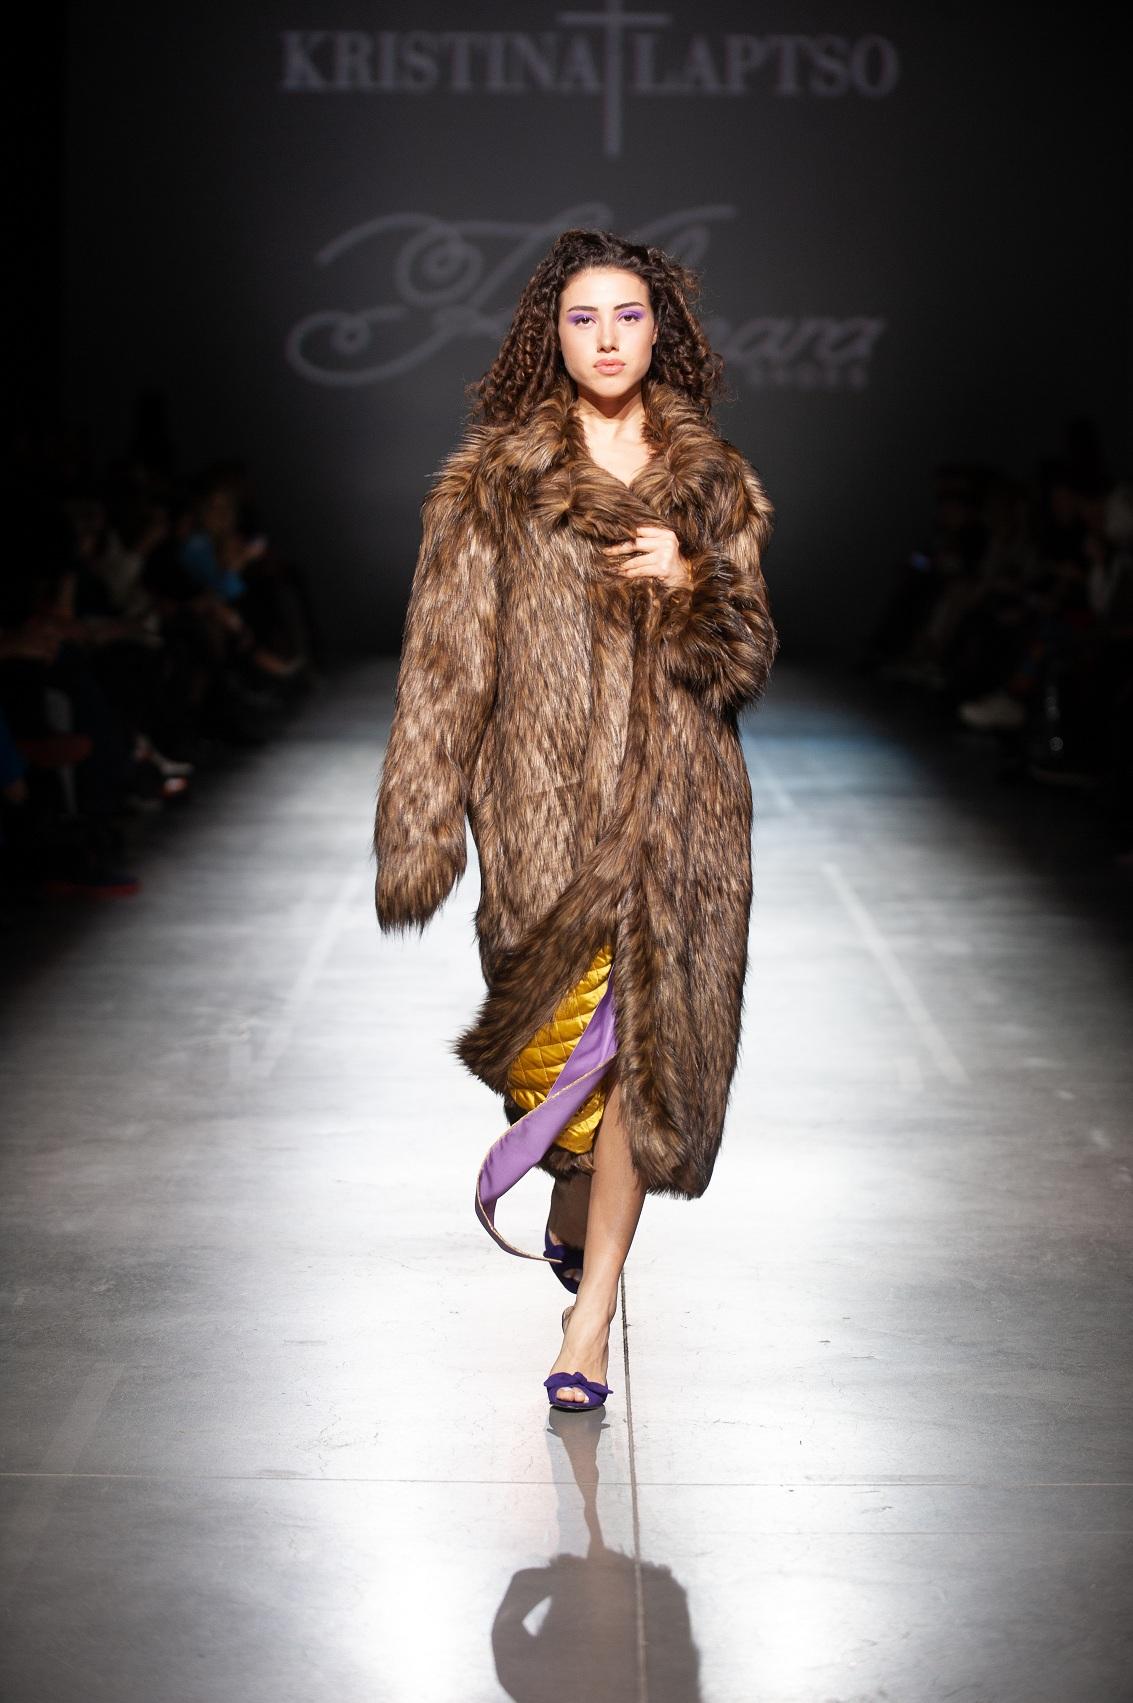 Ukrainian Fashion Week_Kristina Laptso